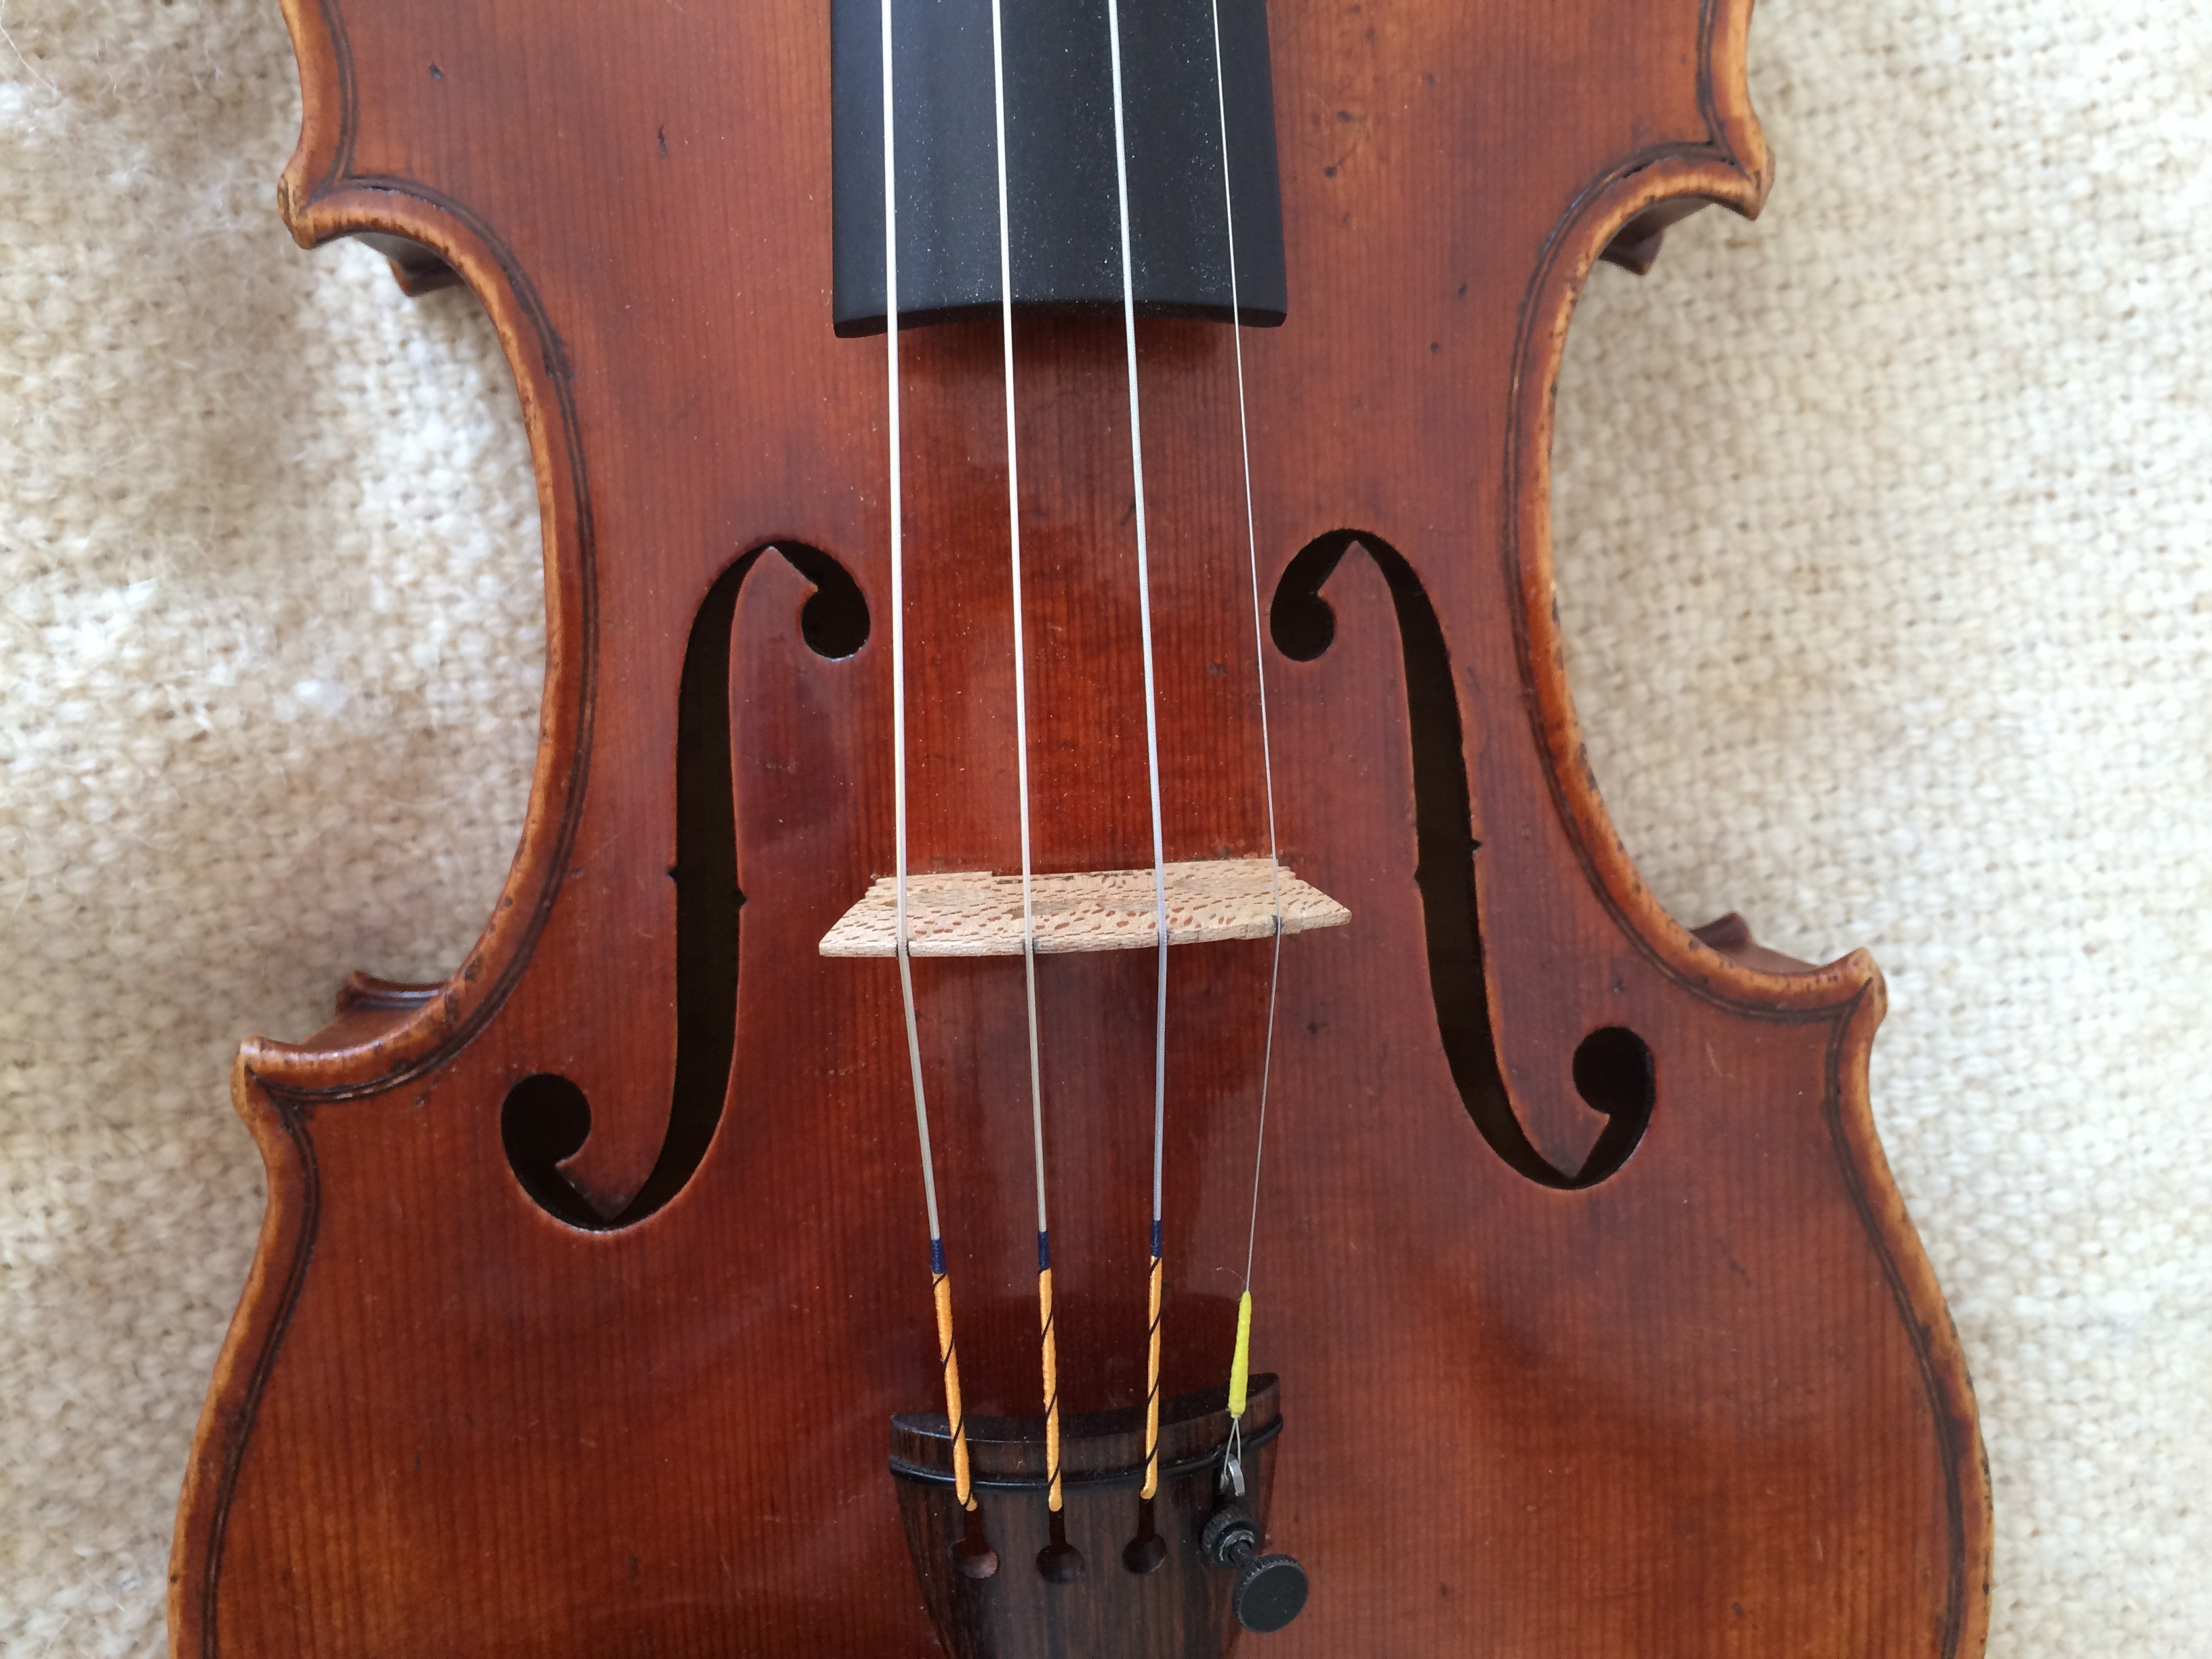 Strings_Music_Horizons_Felix_Krafft_violin_for_sale_F_holes